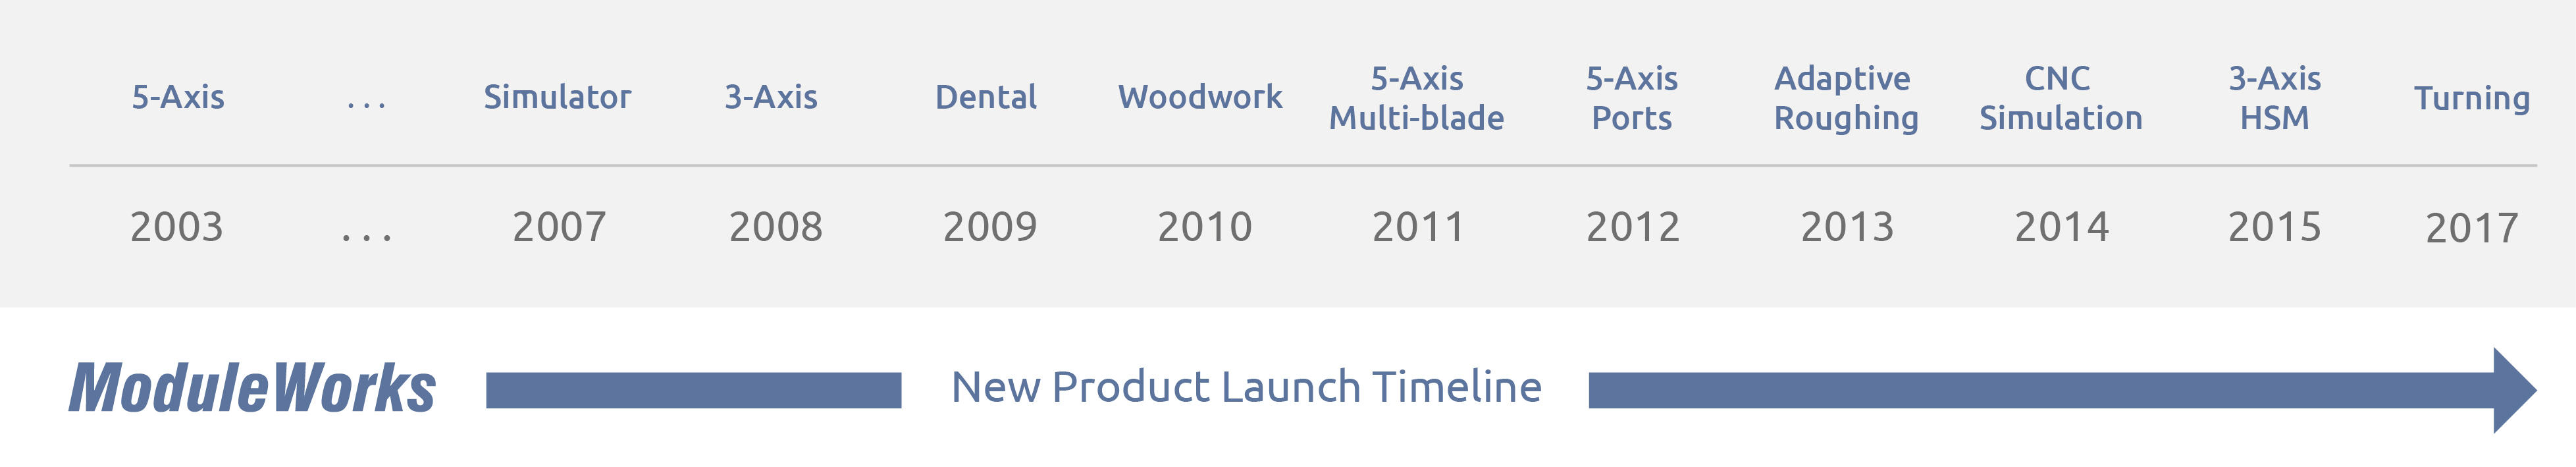 Timeline ModuleWorks 2017